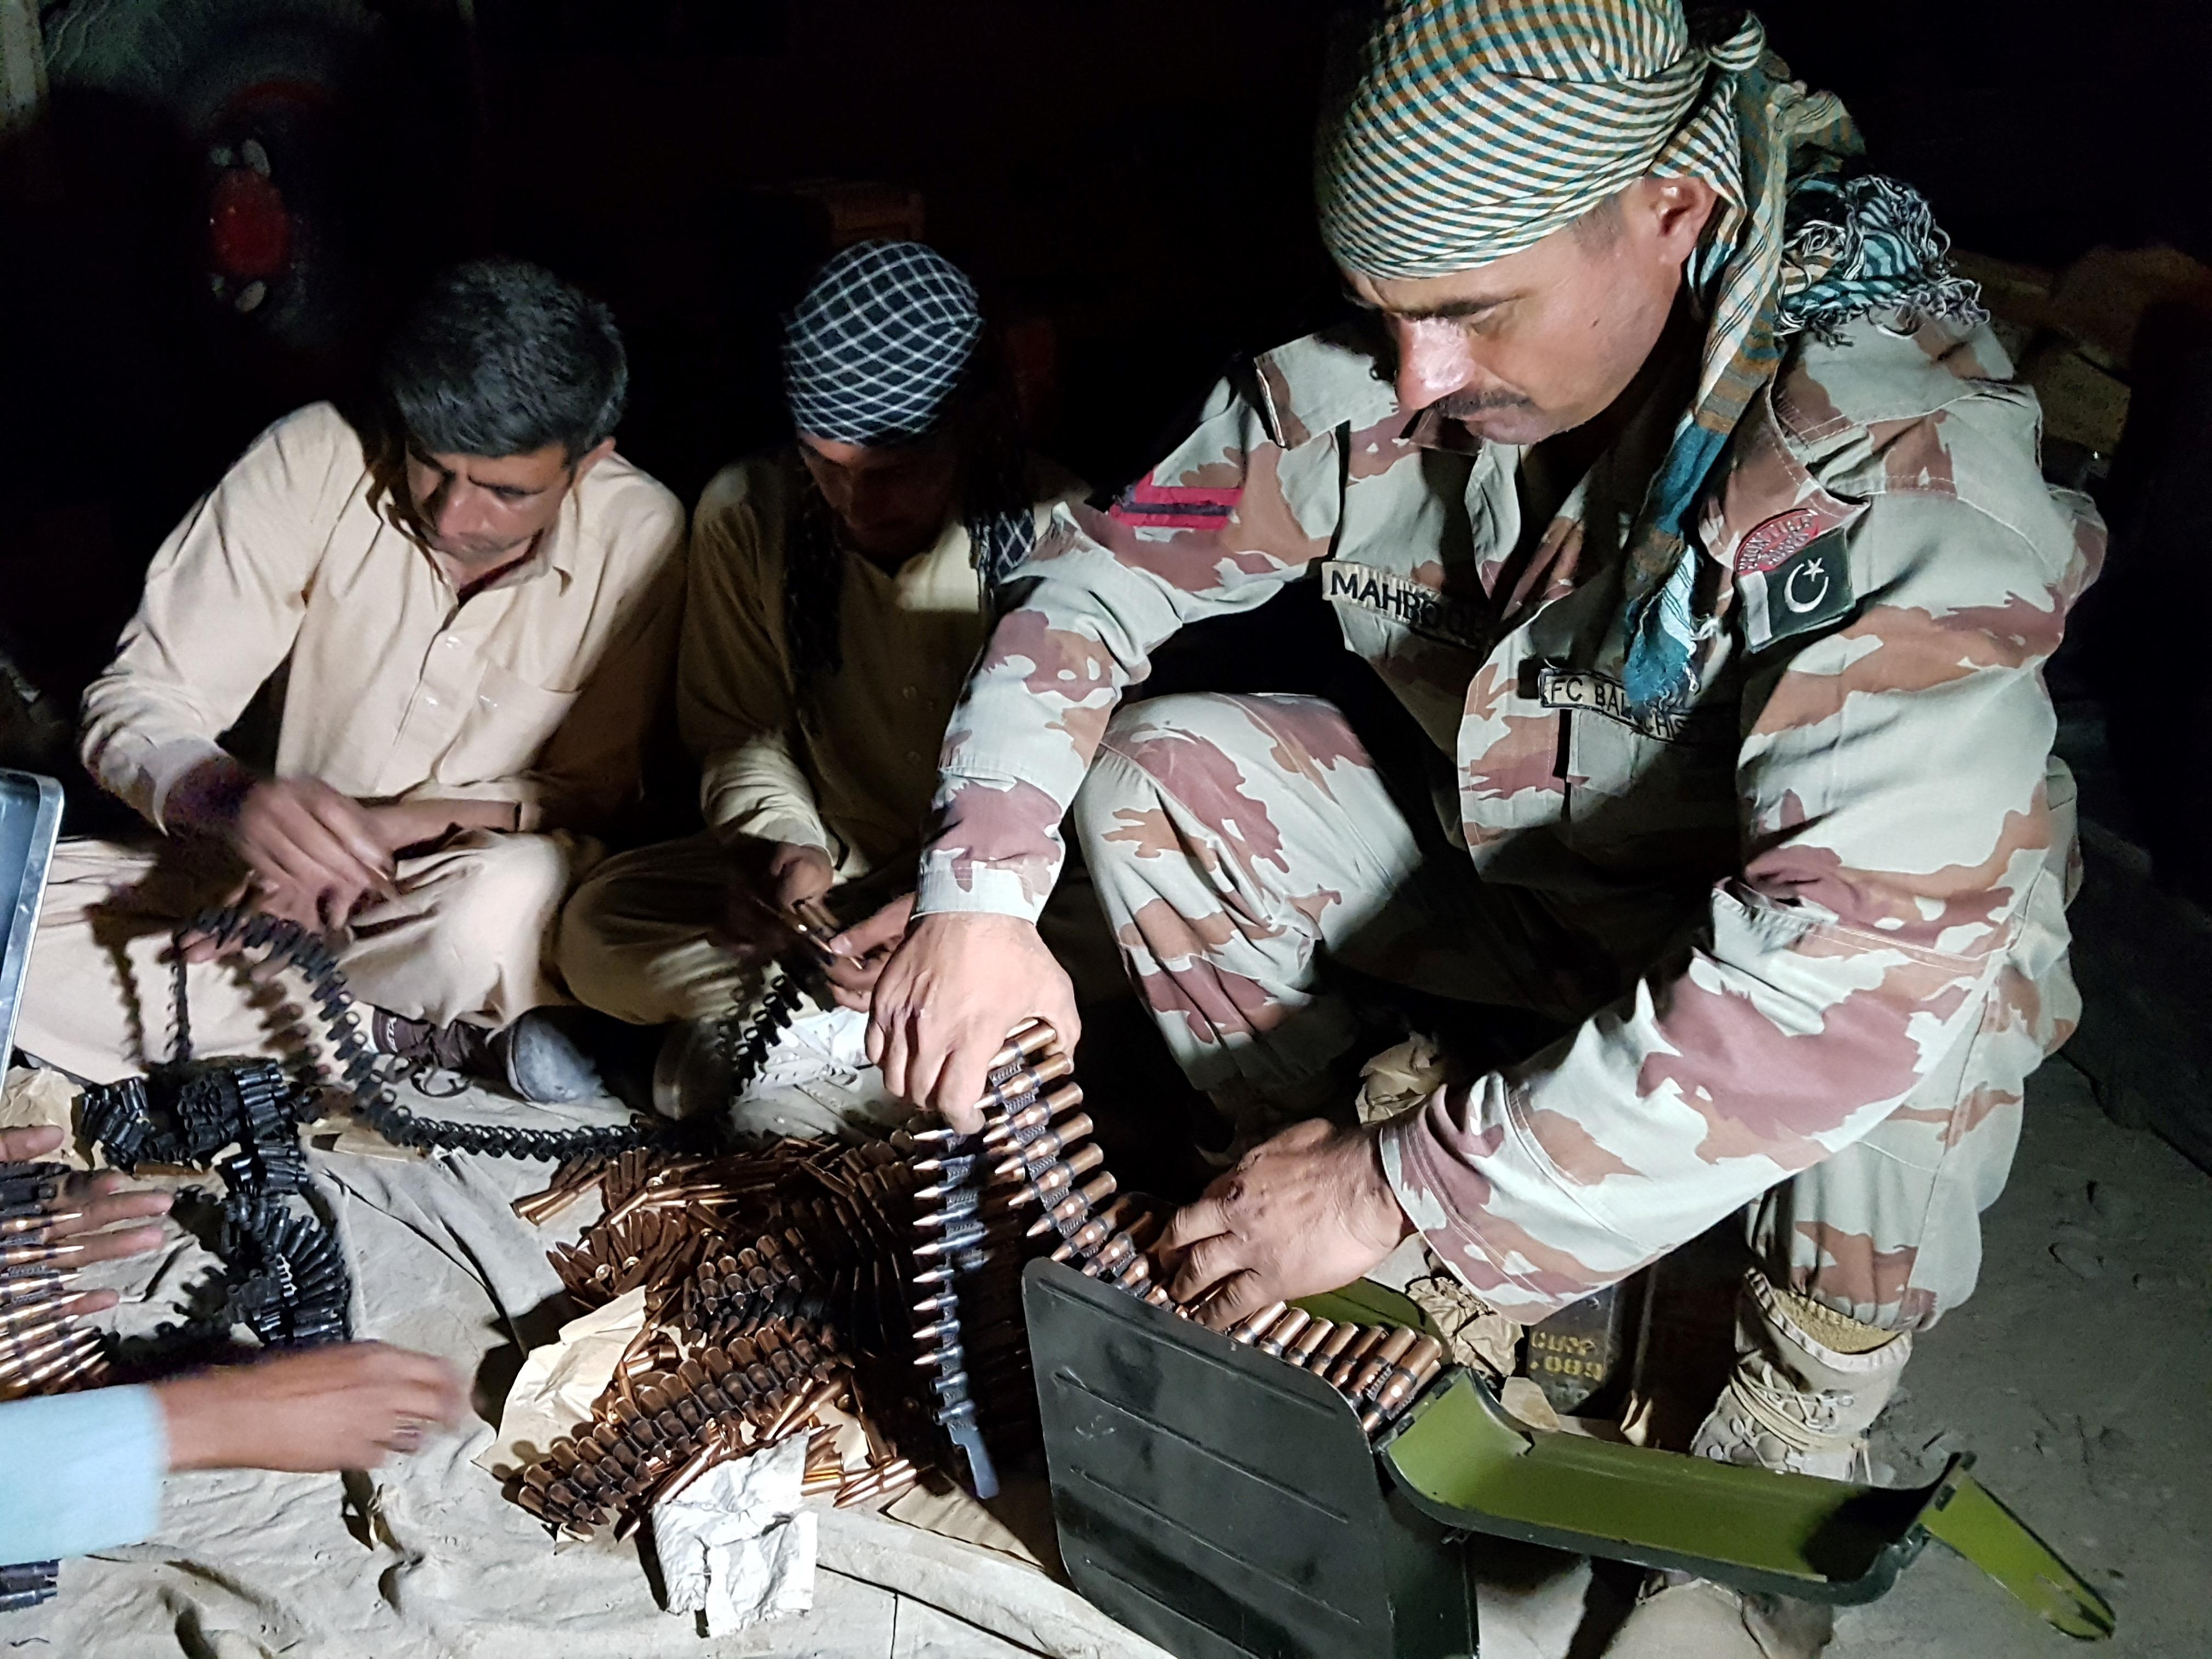 Pakistan emphasises border security to curb militancy